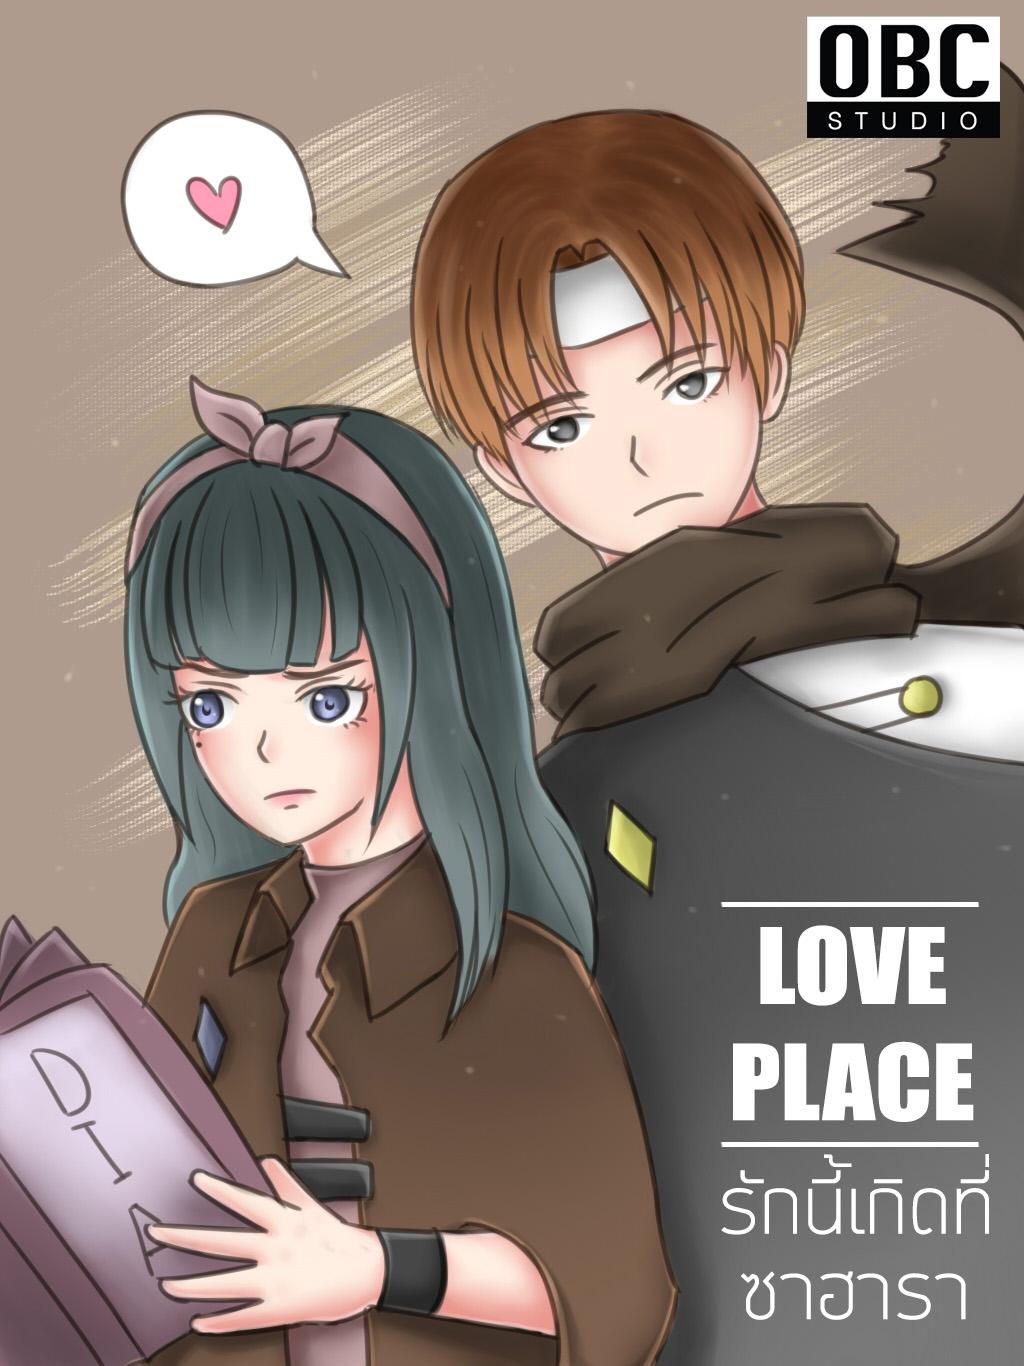 Love Place รักนี้เกิดที่ซาฮารา (ผีรักทุกนาเธอ คอนเทสต์)